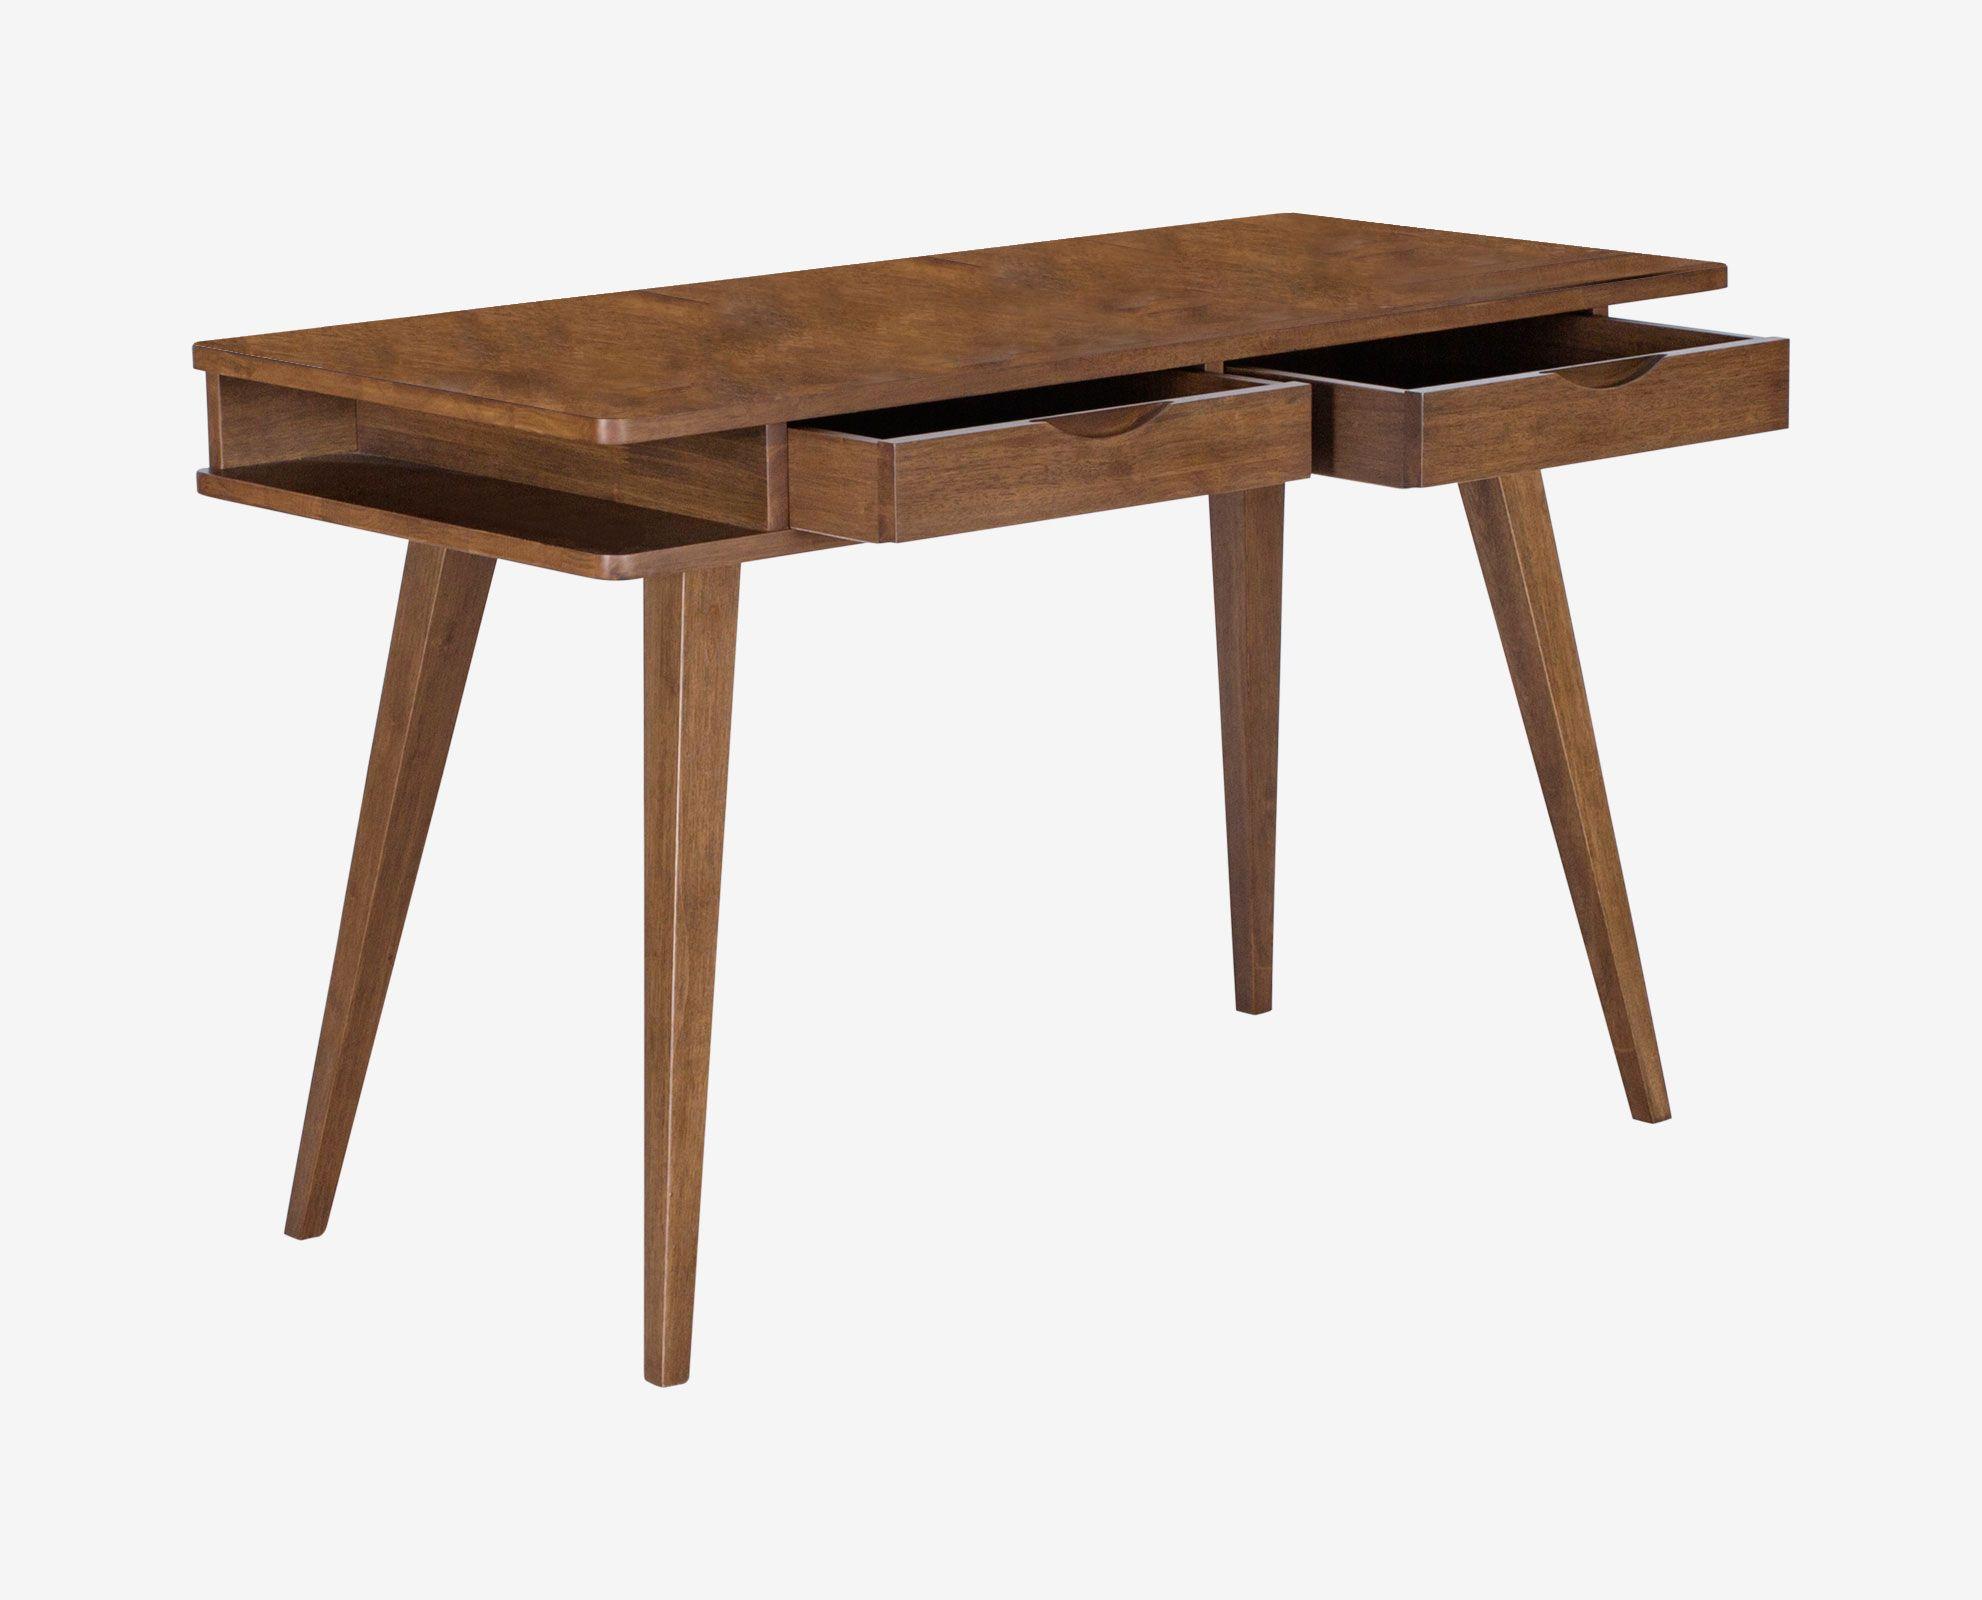 Arbete Desk Desks Scandinavian Designs Scandinavian Design Desk Furniture Scandinavian Furniture